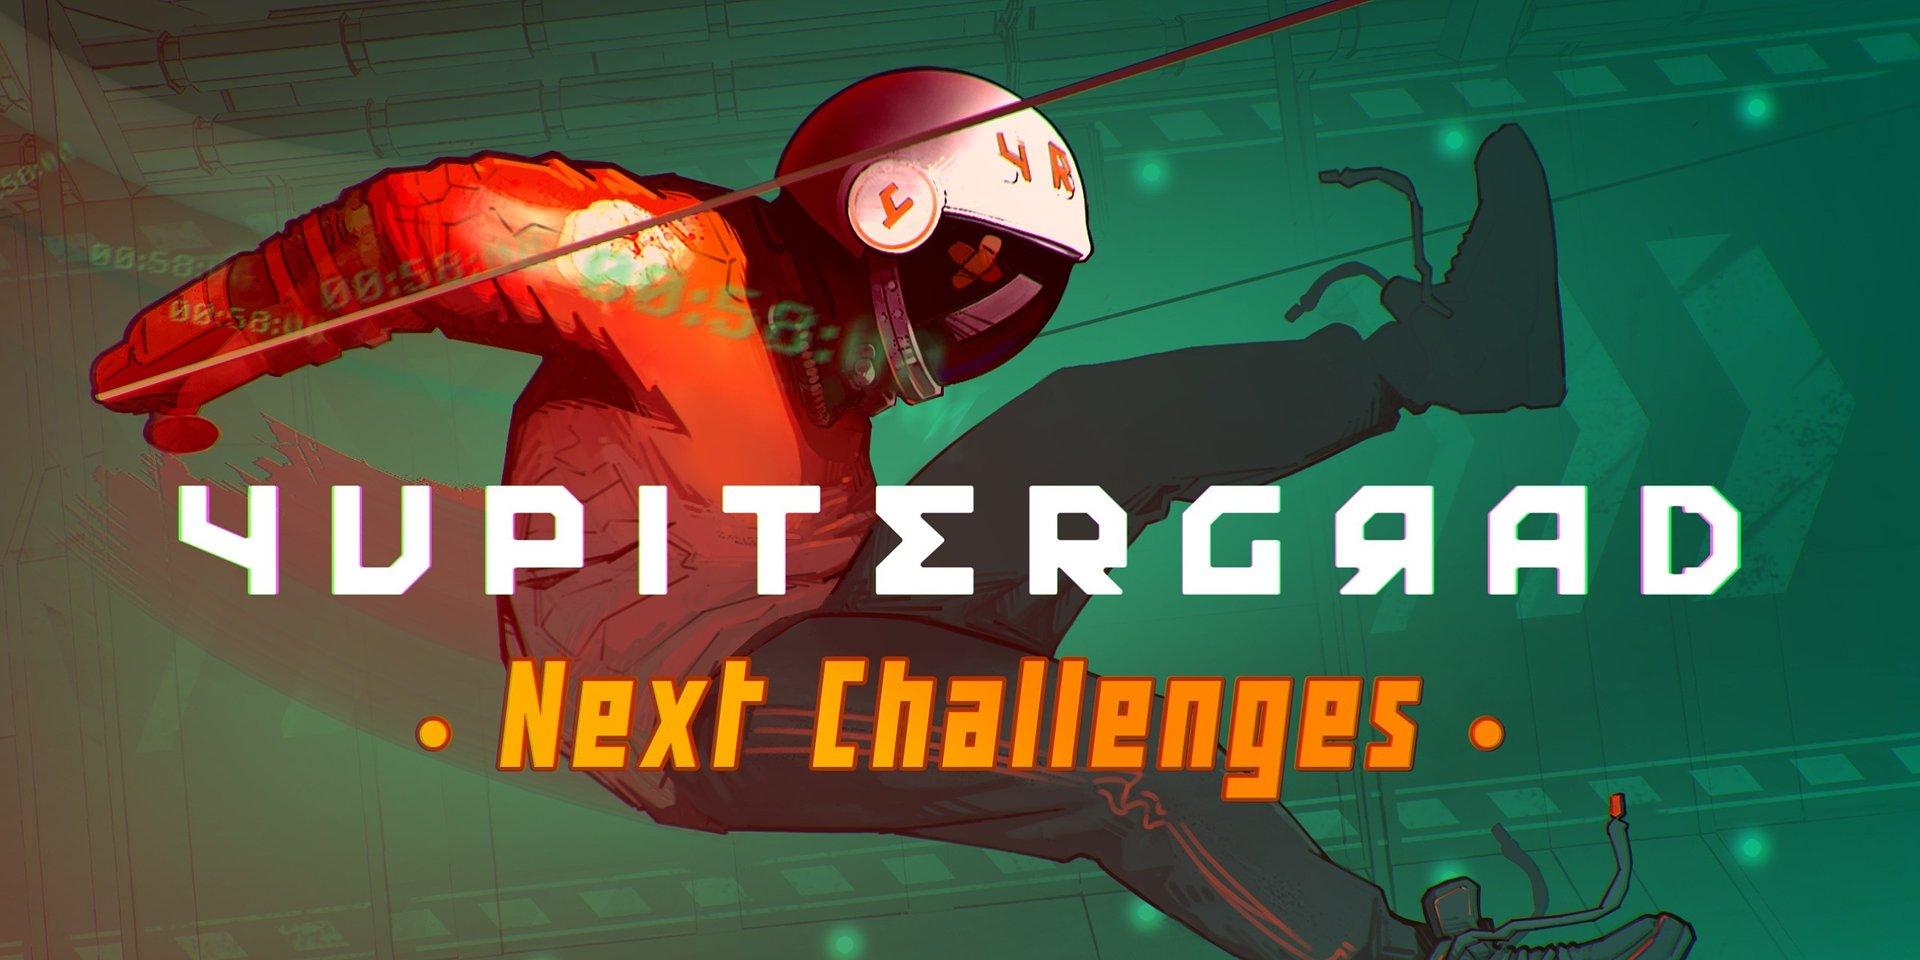 Next Challenges - a free update await space plumbers in Yupitergrad